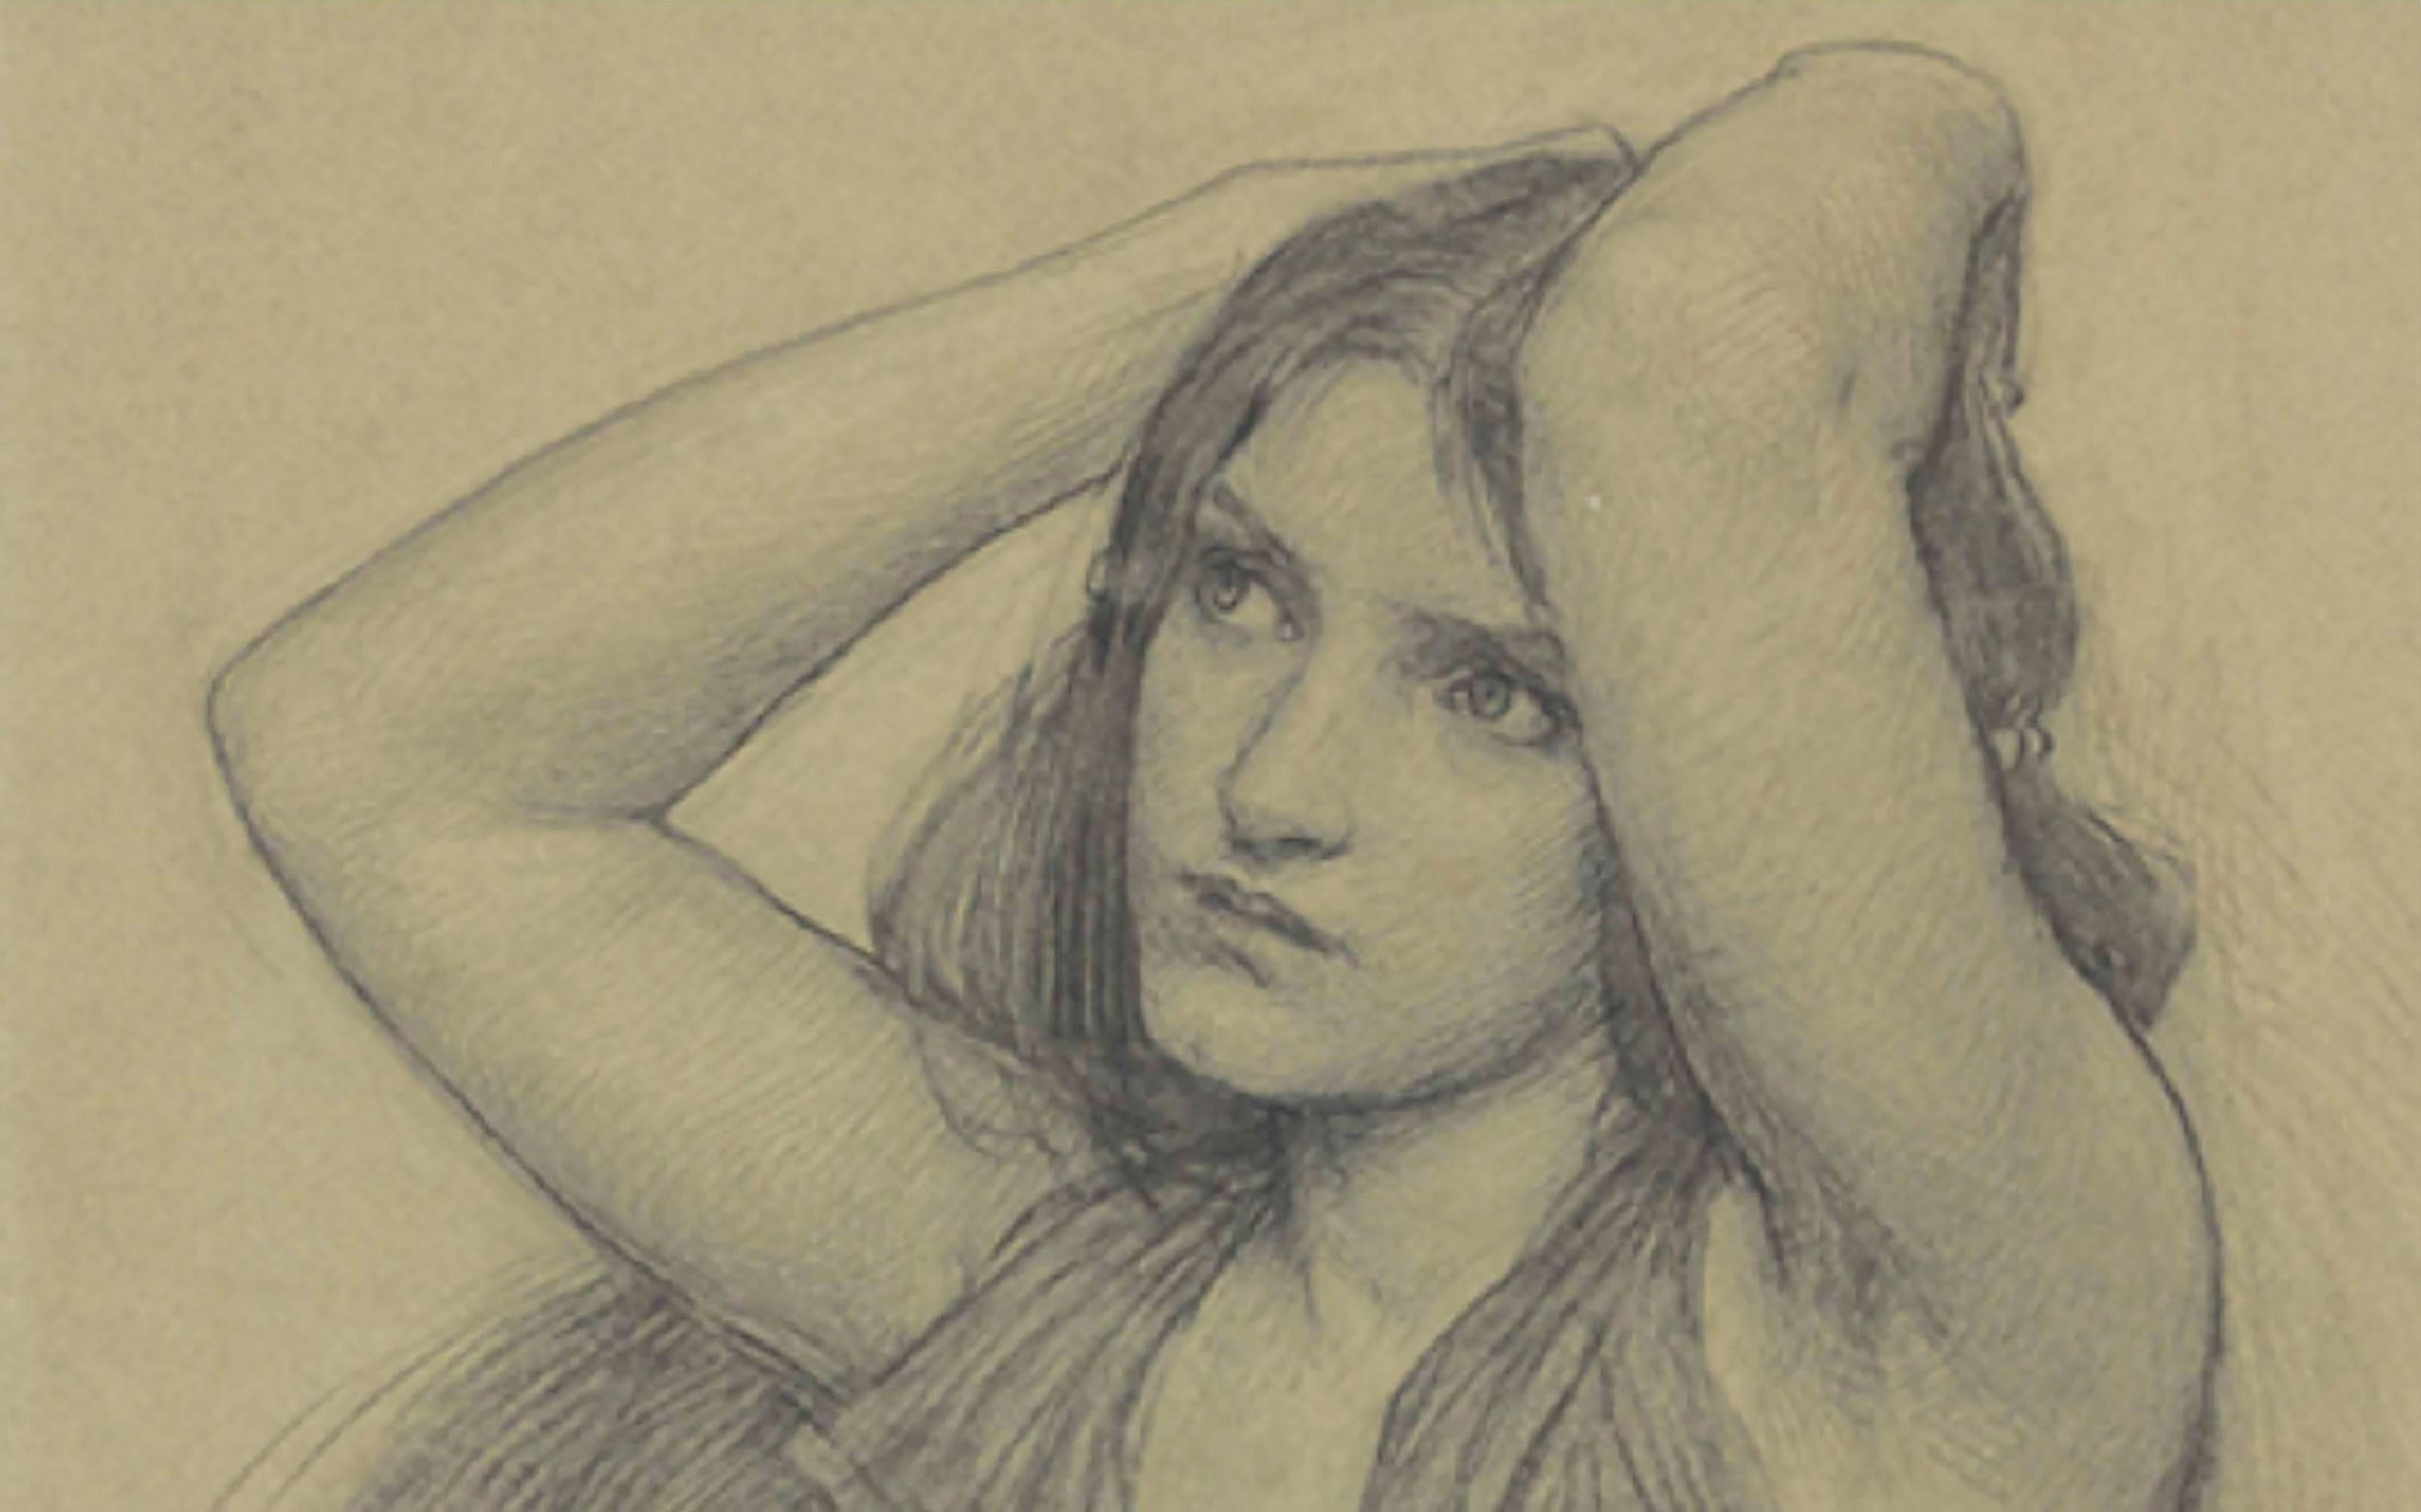 Victorian Pre-Raphaelite & Bri auction at Christies